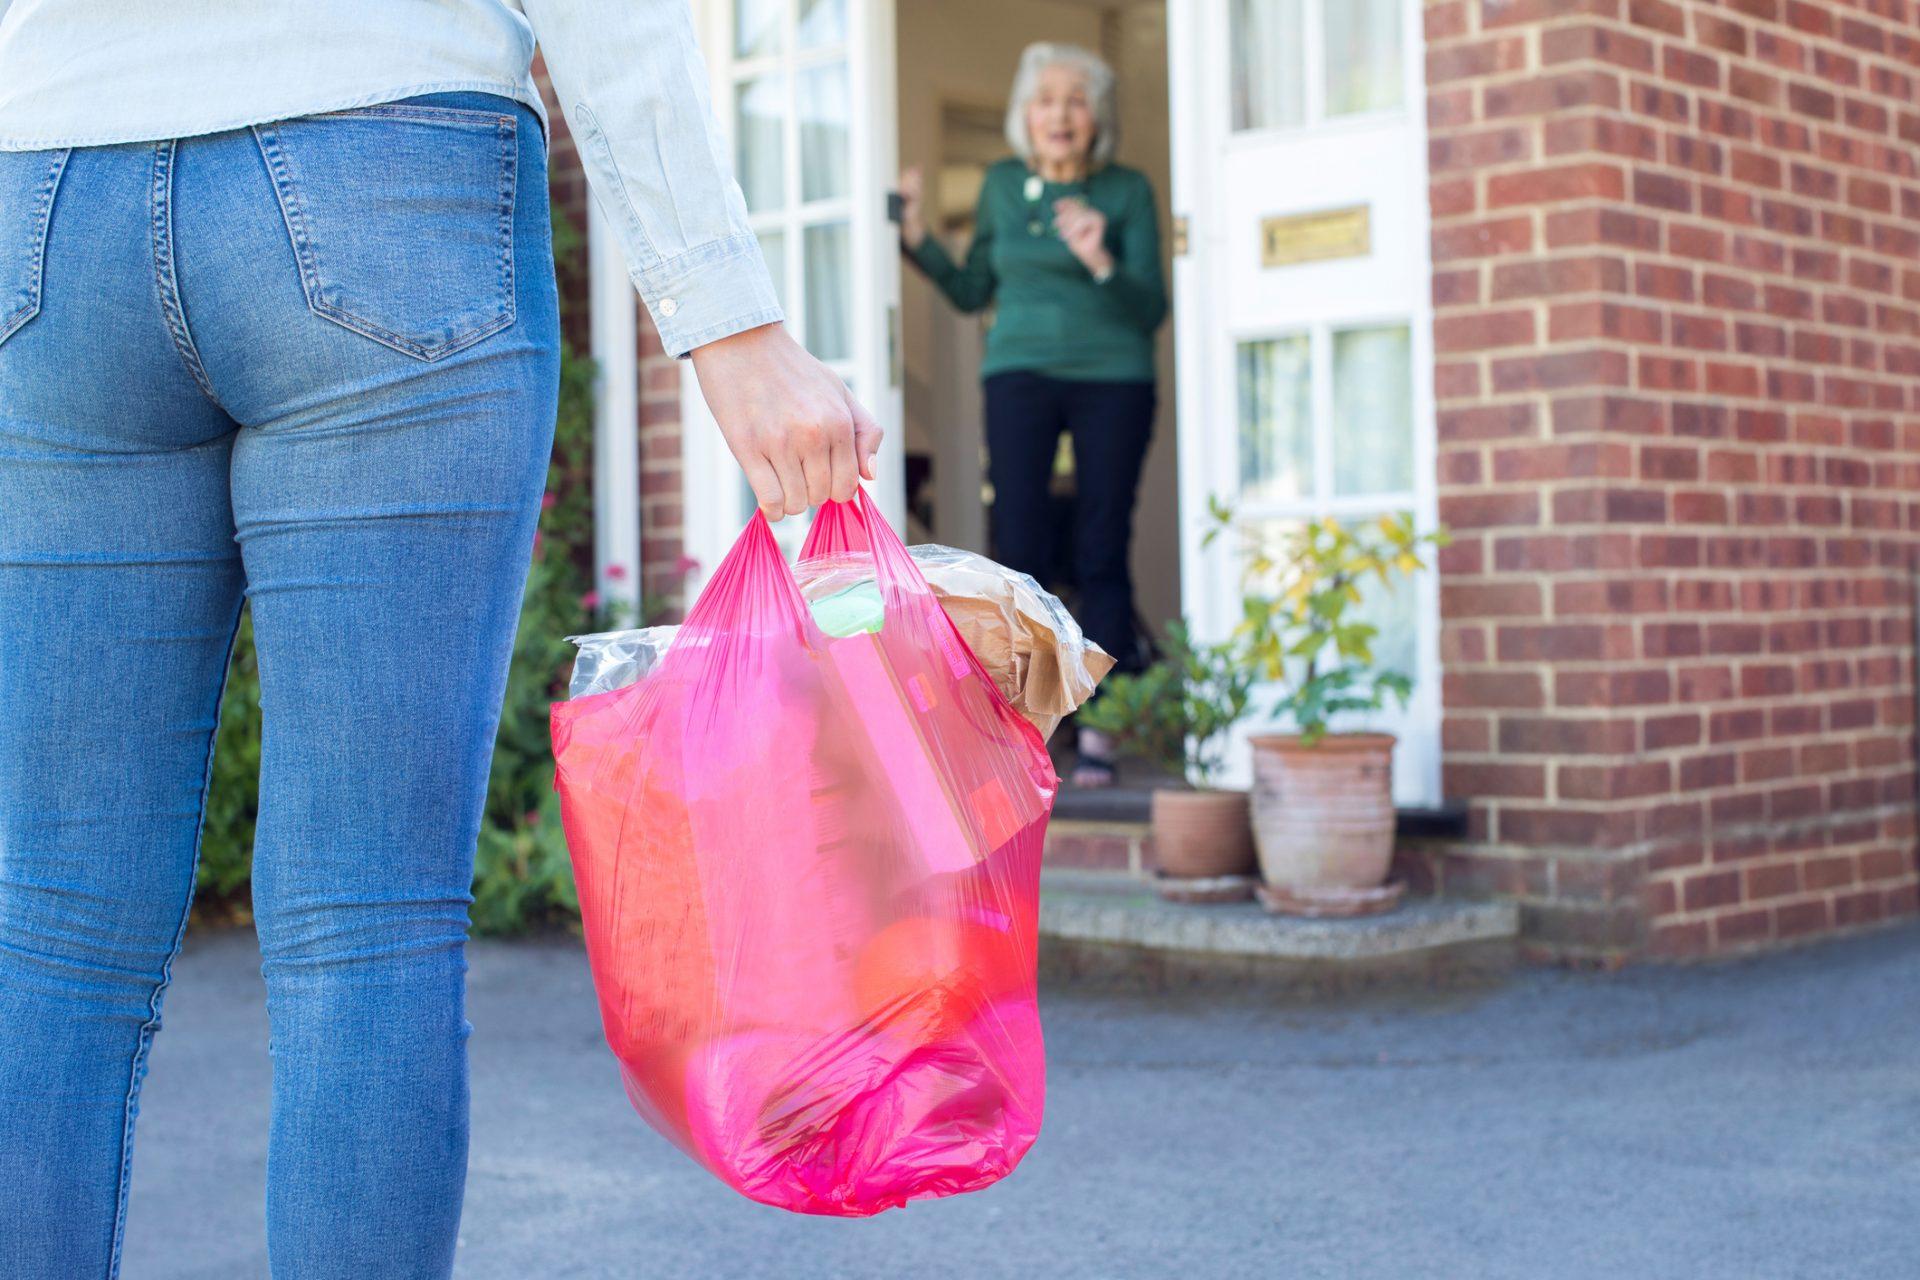 woman bringing groceries to older adult